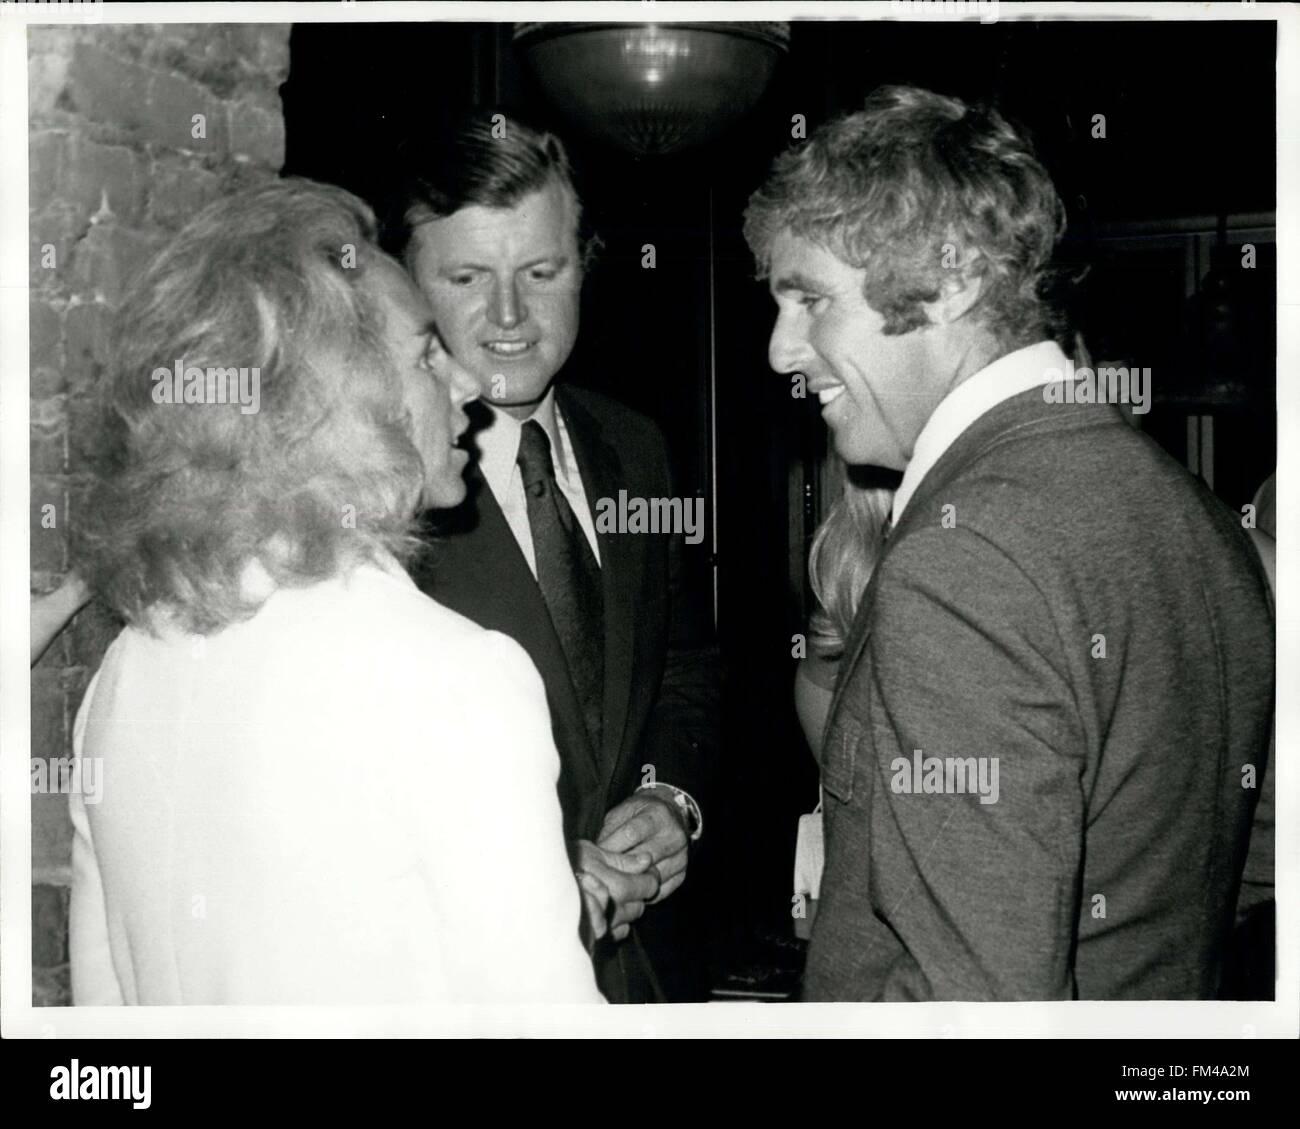 1971 - Ethel & Ted Kennedy, burt bacharach © Keystone Pictures USA/ZUMAPRESS.com/Alamy Live News - Stock Image